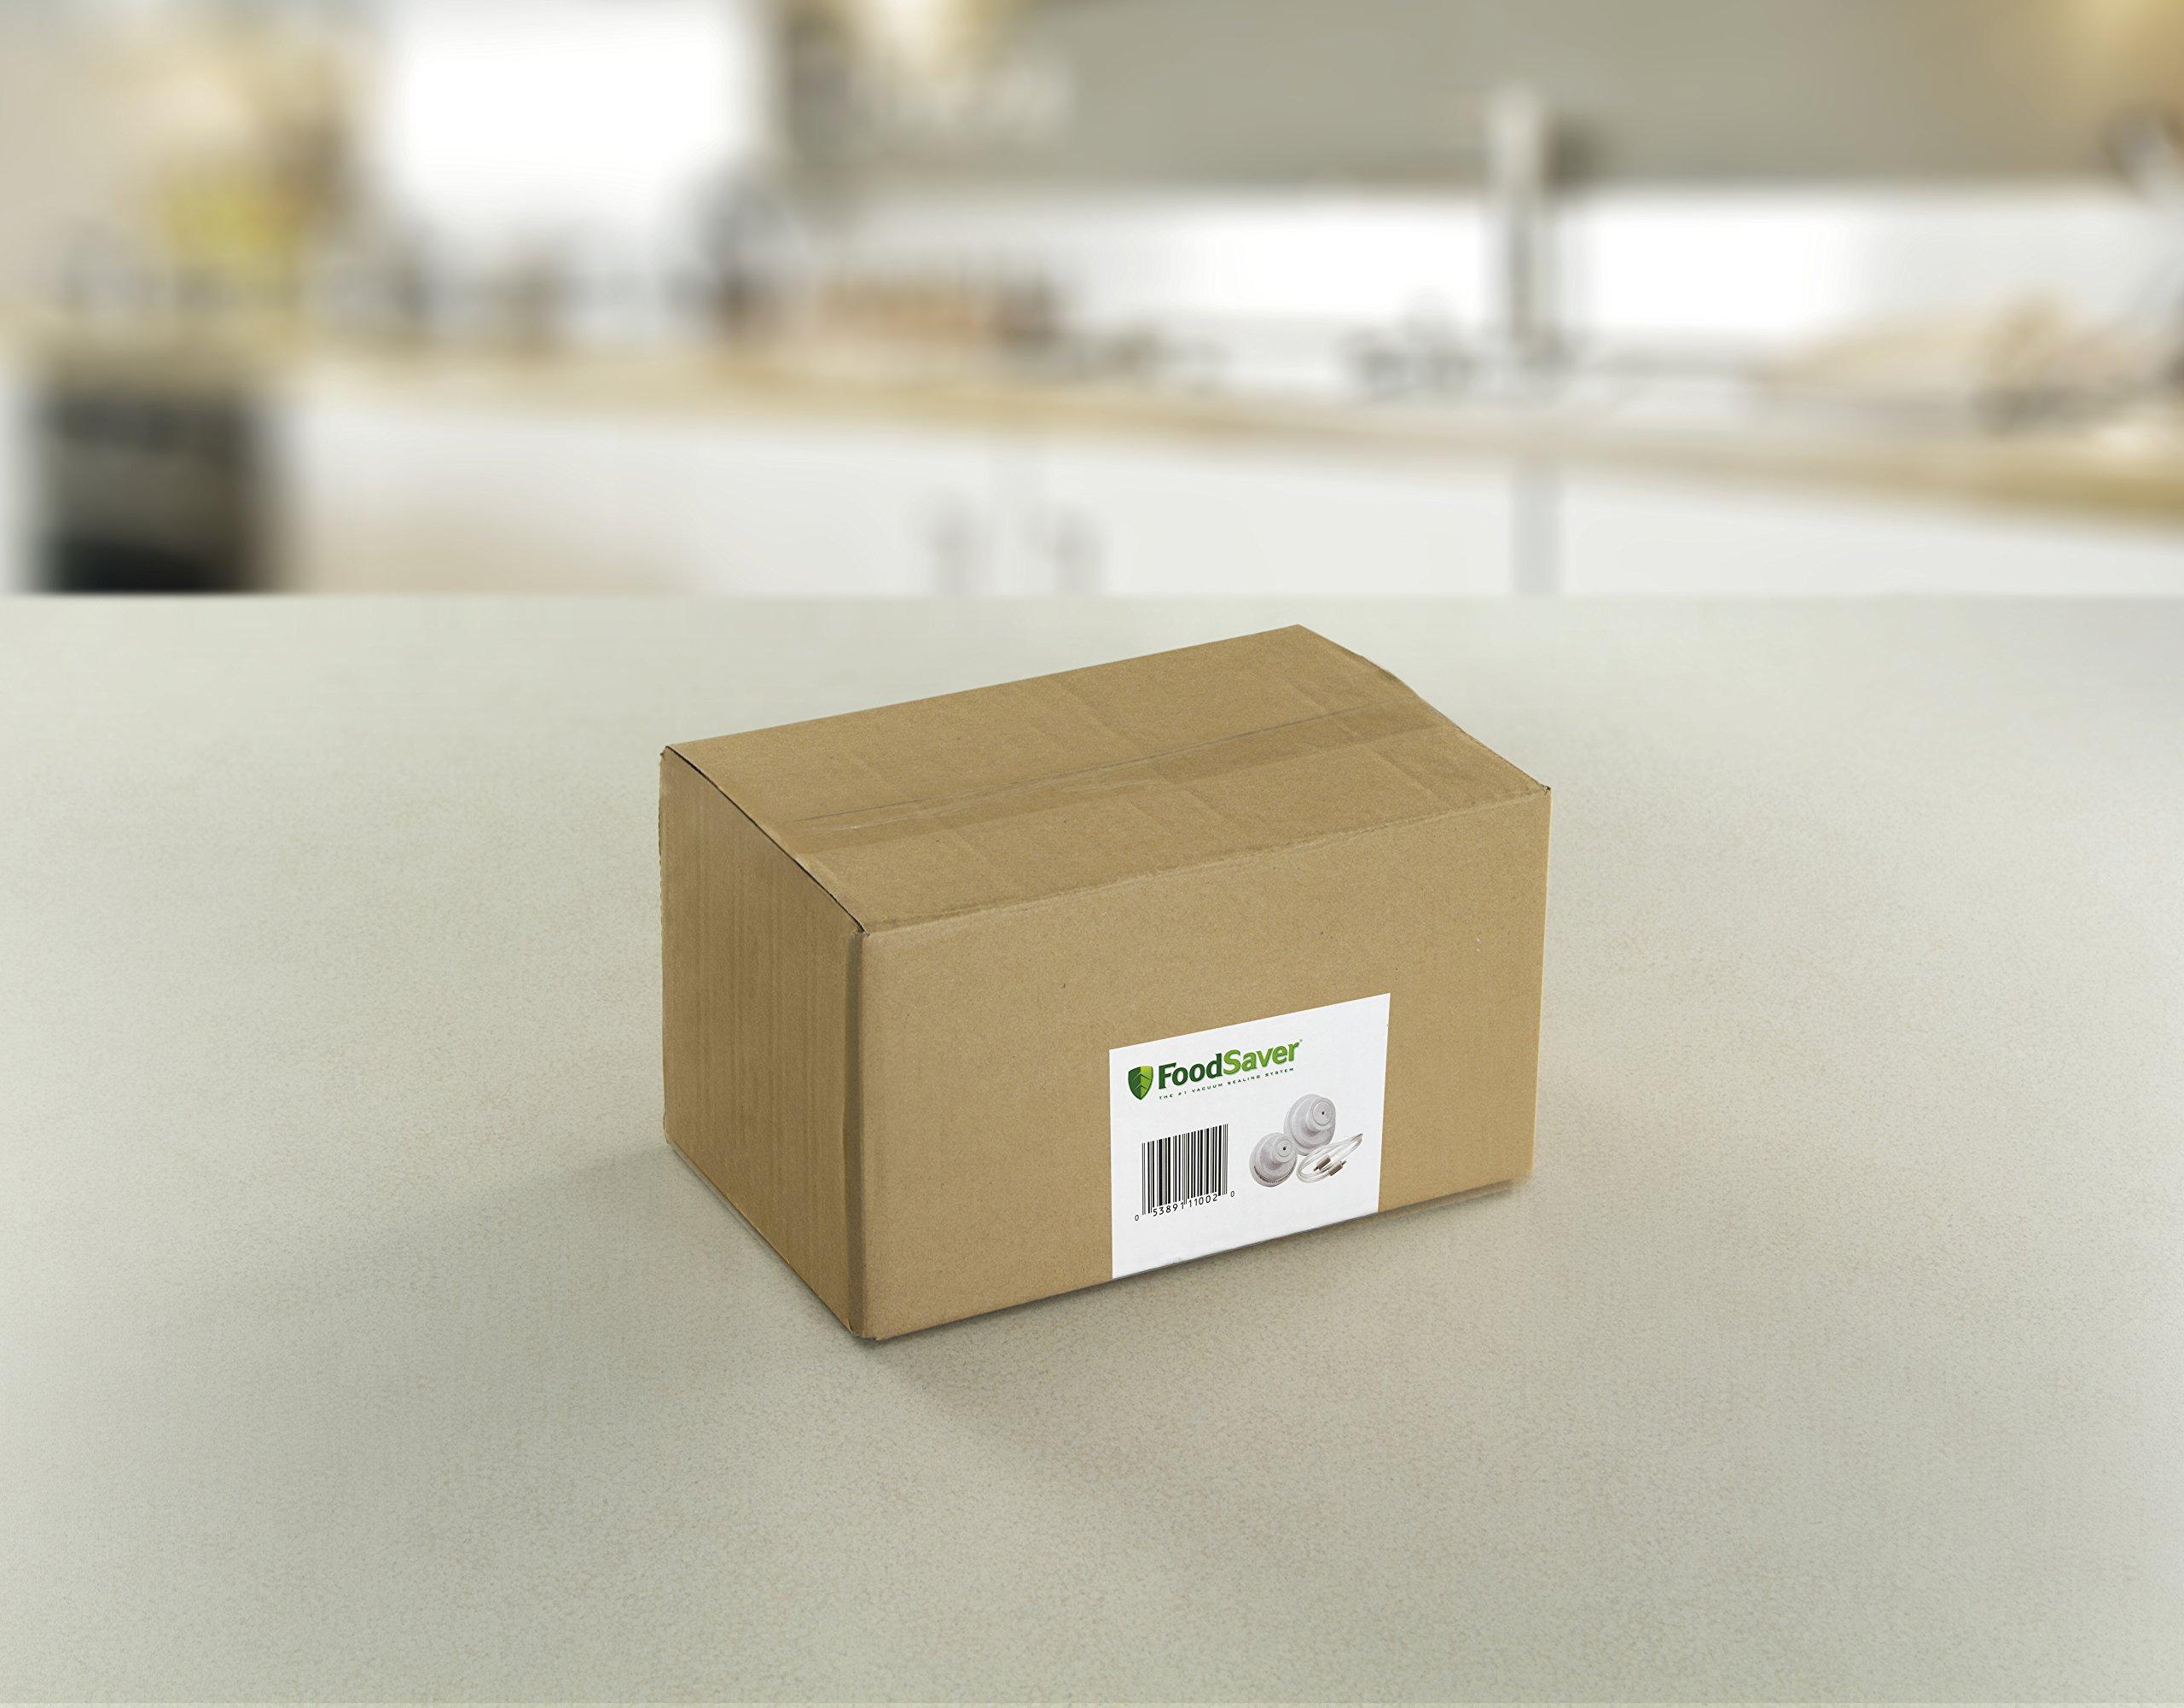 FoodSaver Vacuum Sealer FCARWJAH-000 Wide-Mouth Jar Kit with Regular Sealer and Accessory Hose, White by FoodSaver (Image #3)